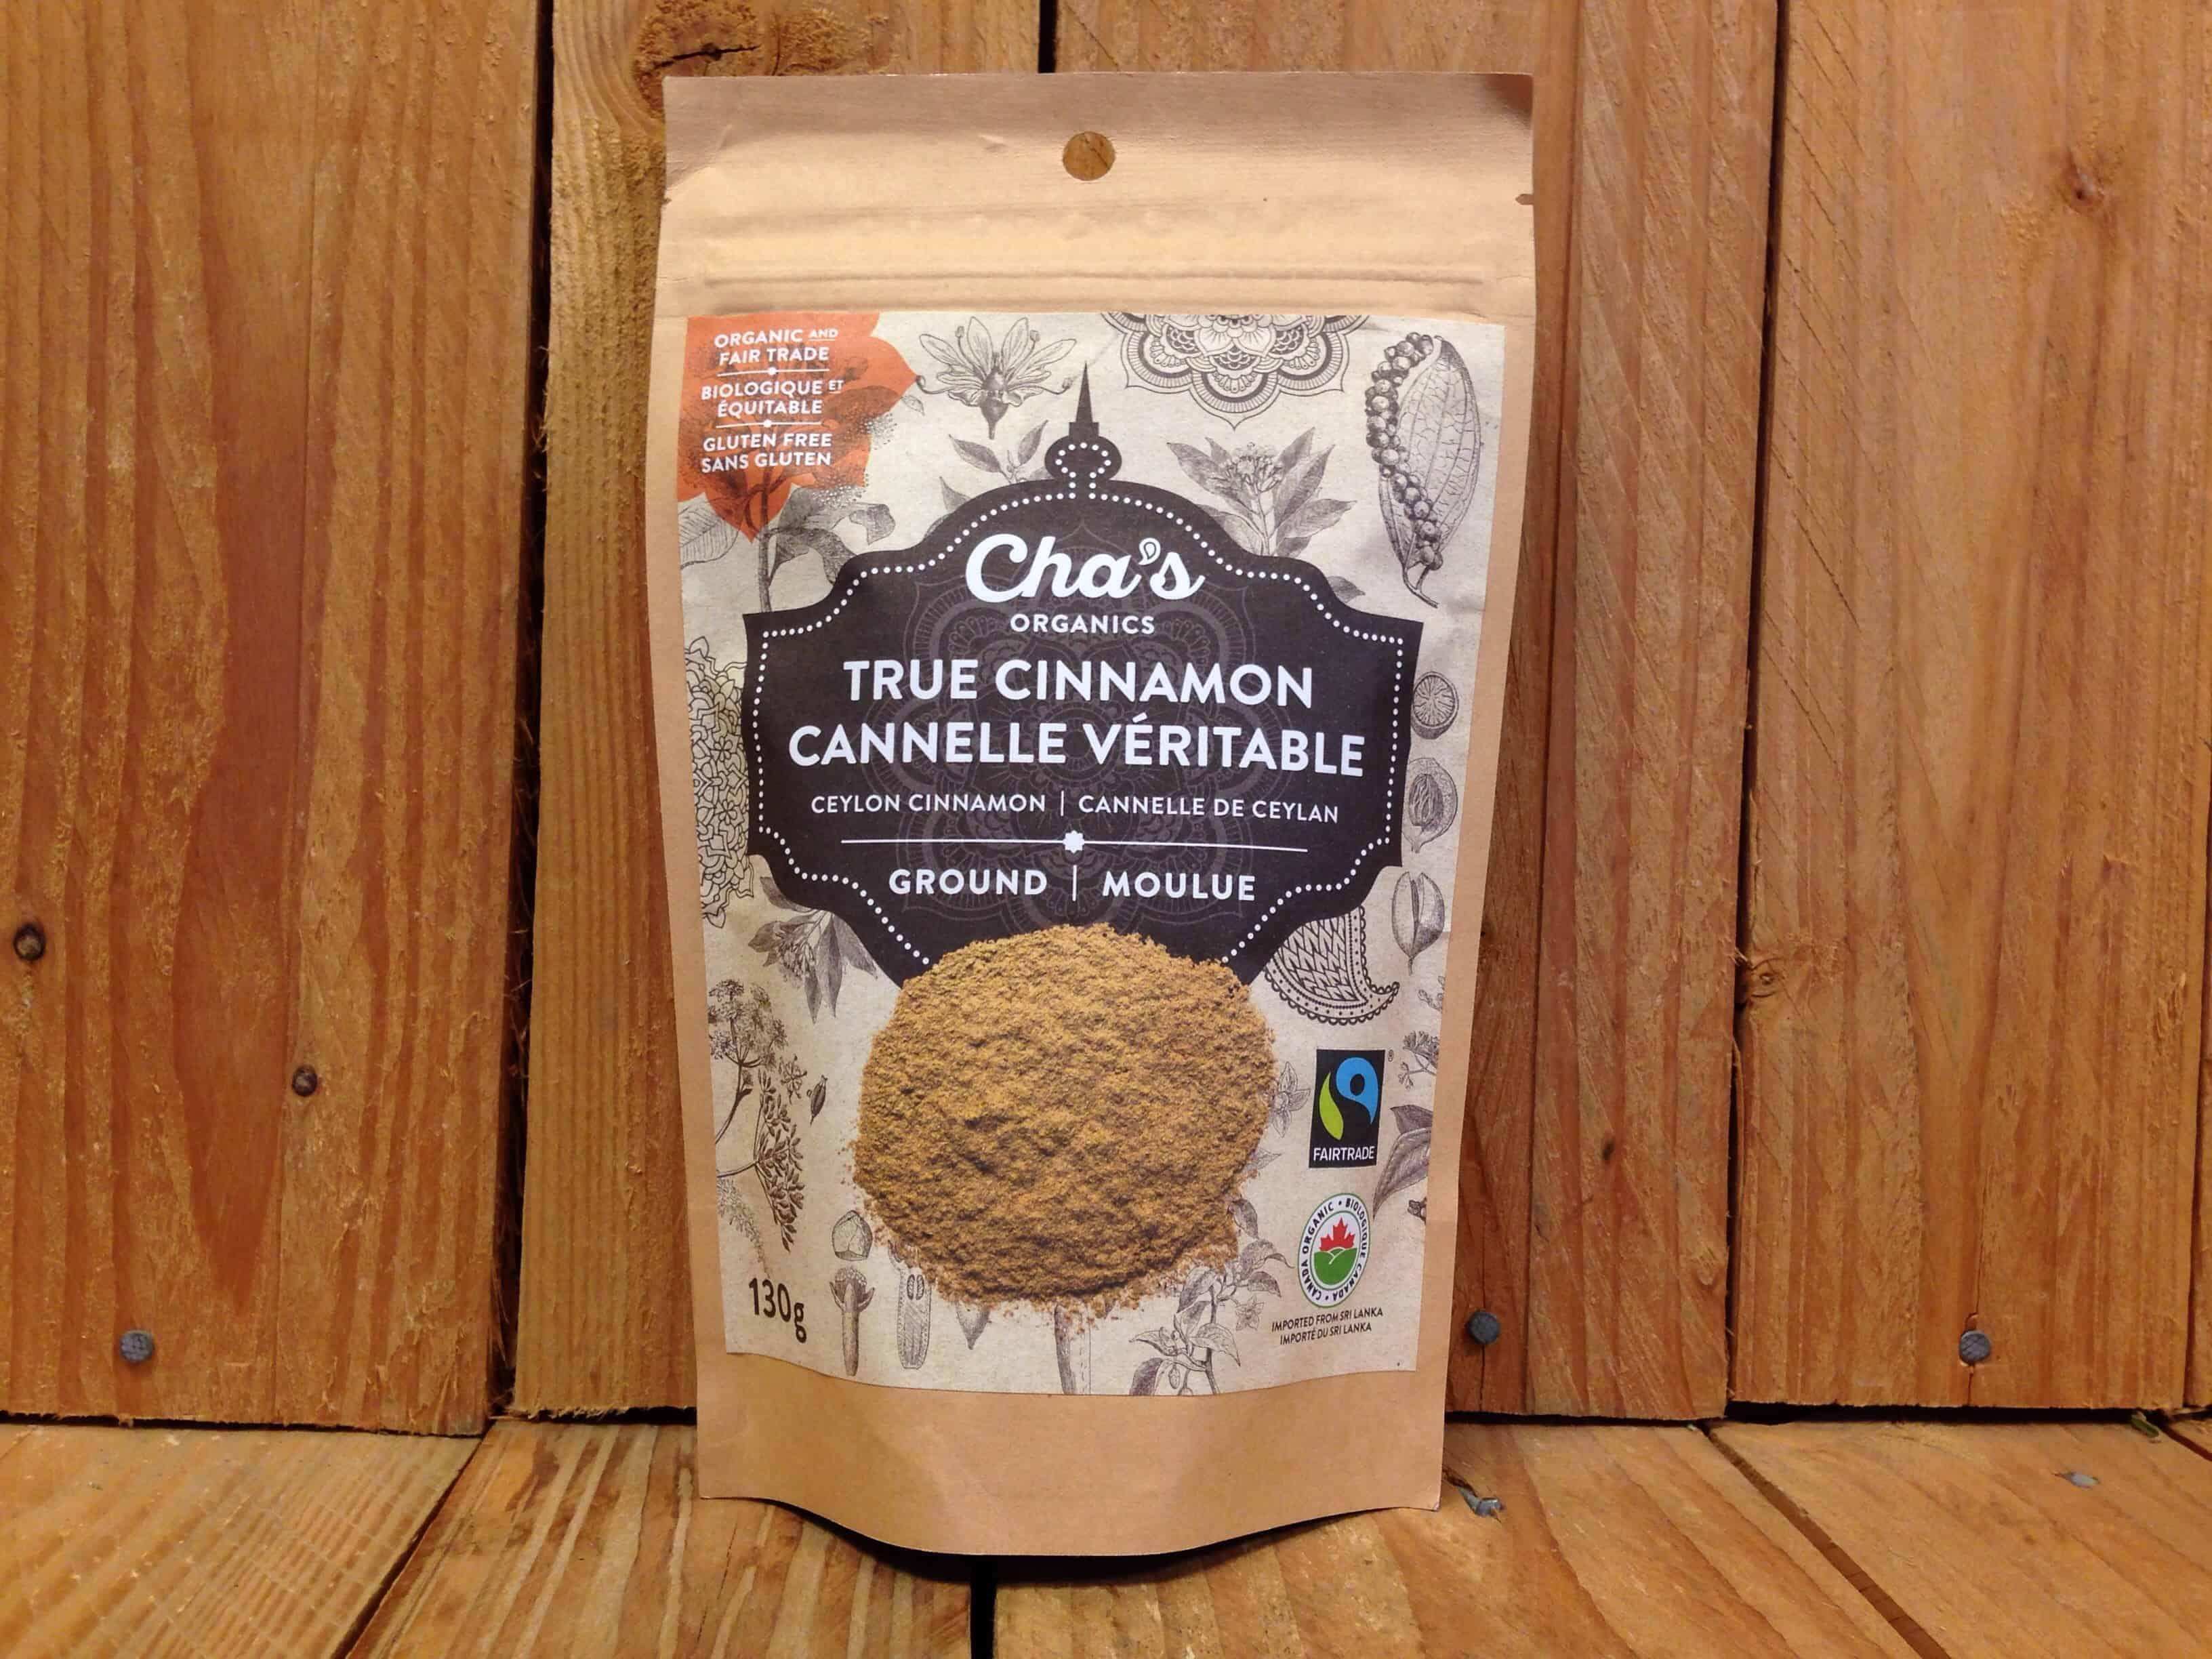 Cha's – Organic True Cinnamon – Ground (130g Bag)